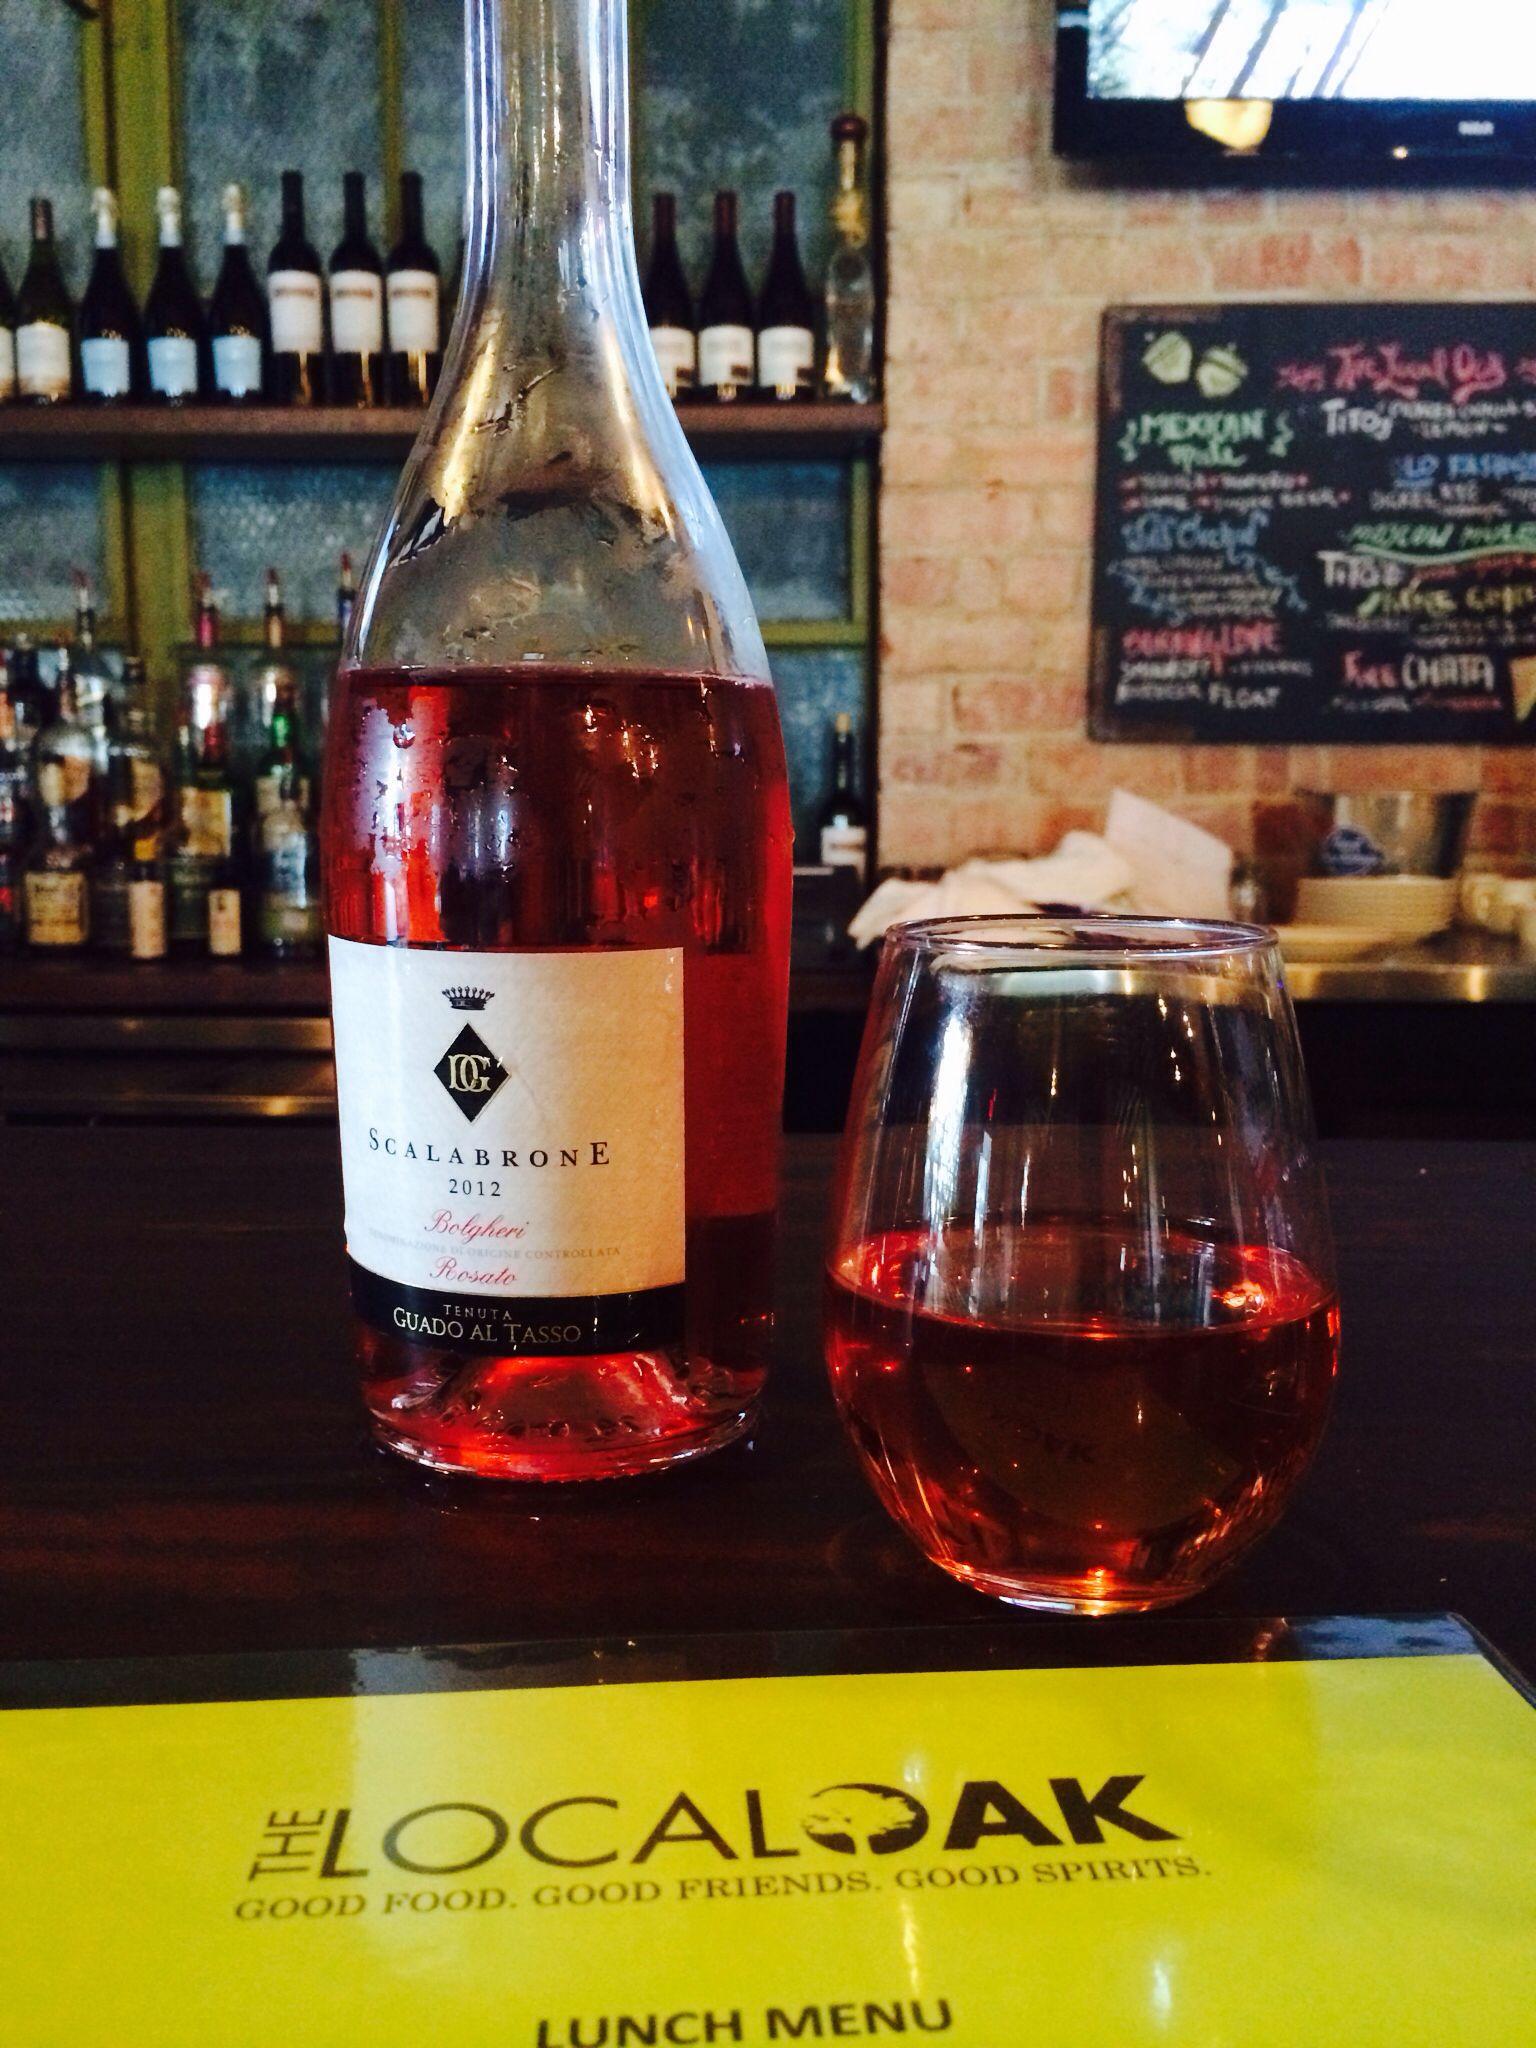 Scalabrone Rosato From Bolgheri With Wine Bottle Good Spirits Rose Wine Bottle